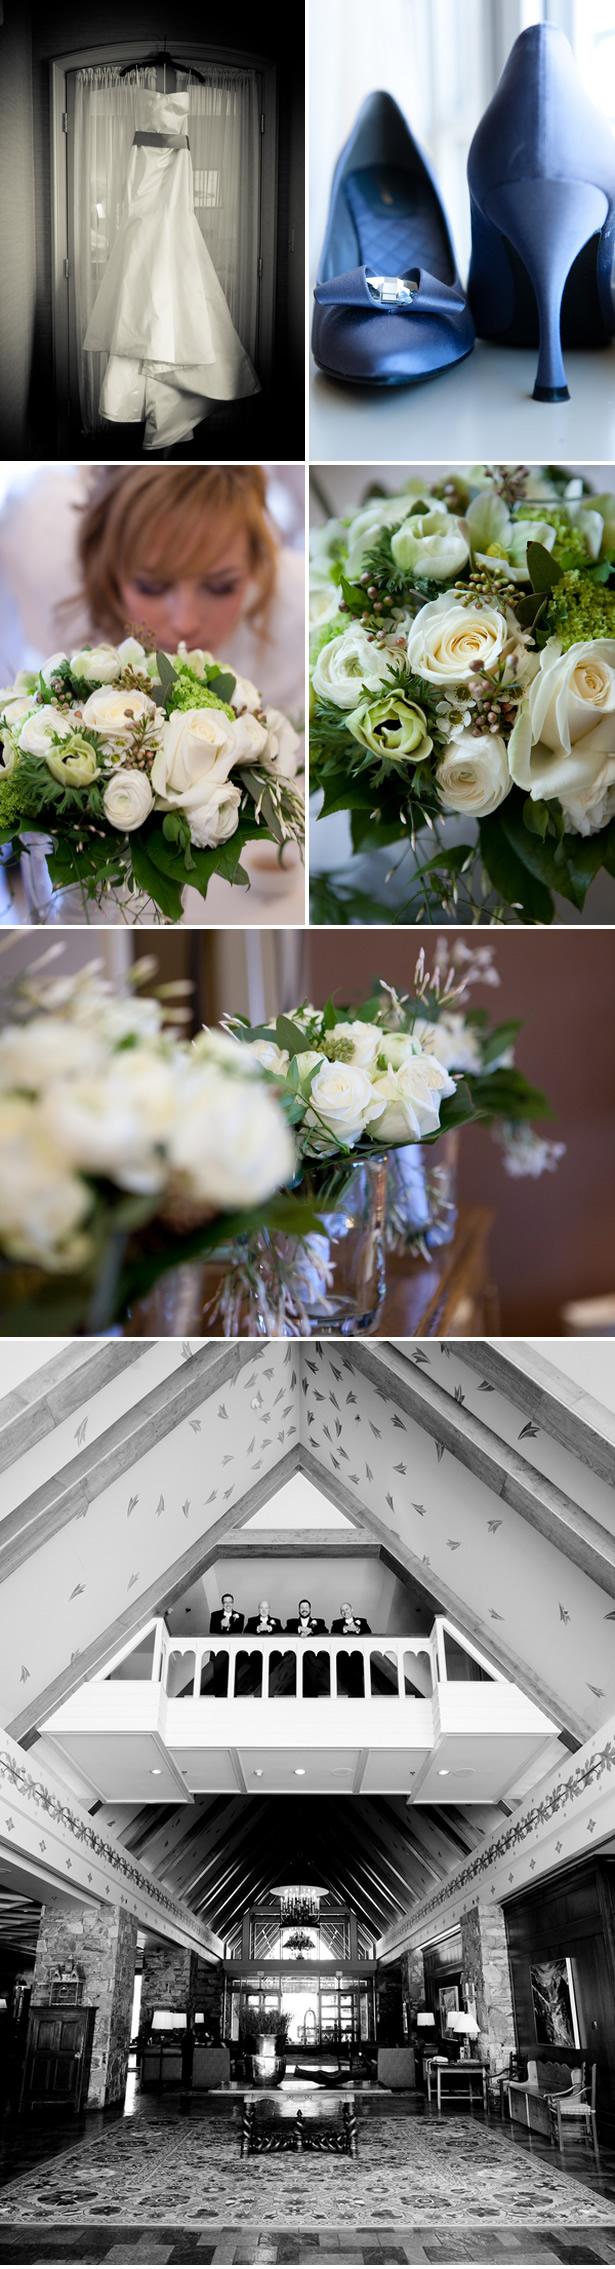 Whistler Weddings   Wedding Planning Ideas   WeddingWire: The Blog ...